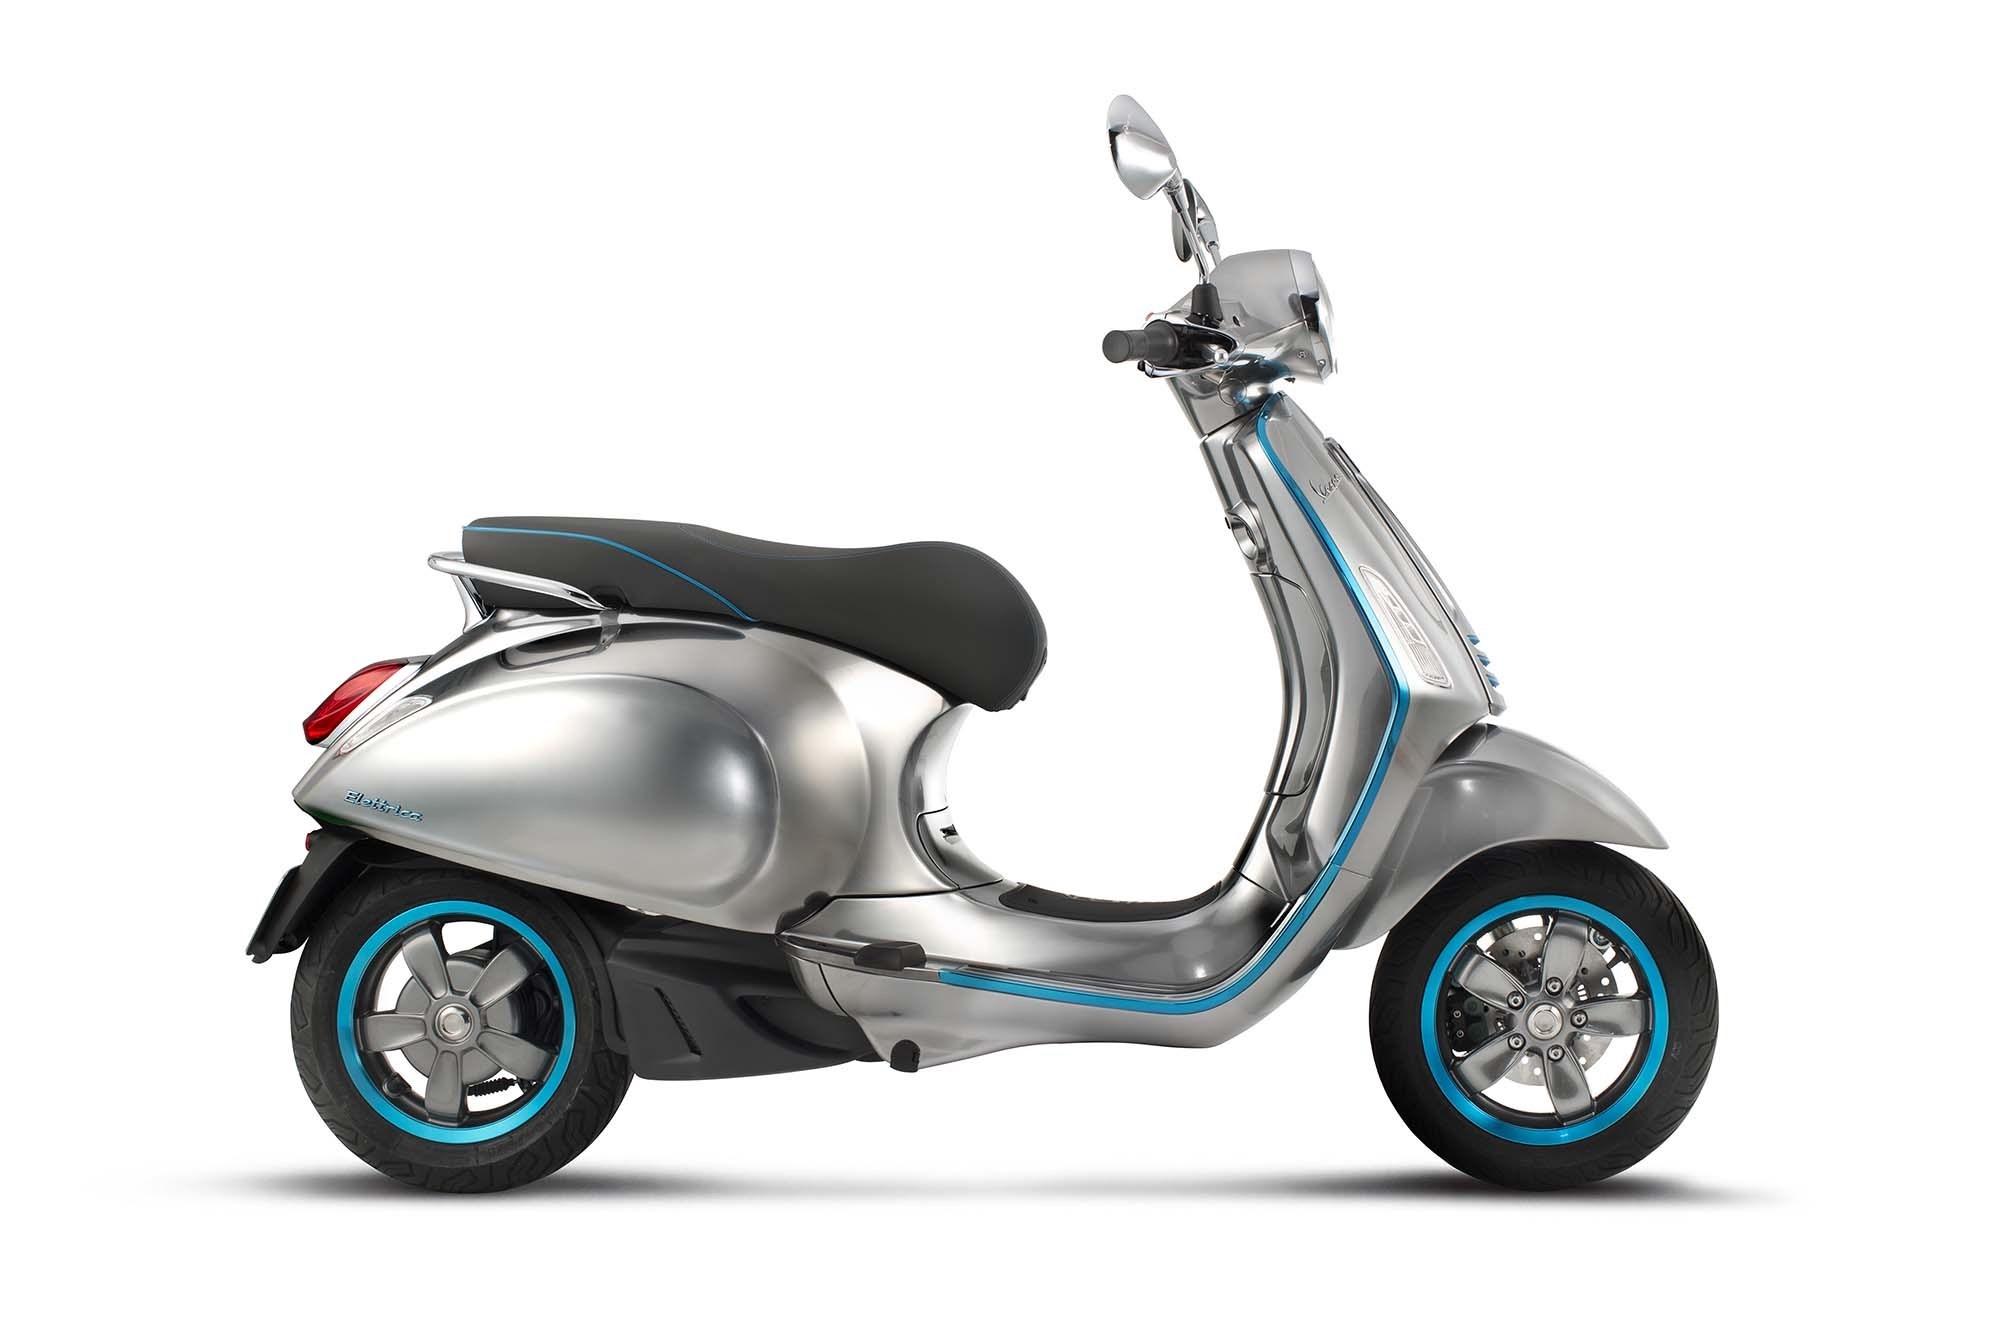 Vespa-Elettrica-electric-scooter-02.jpg